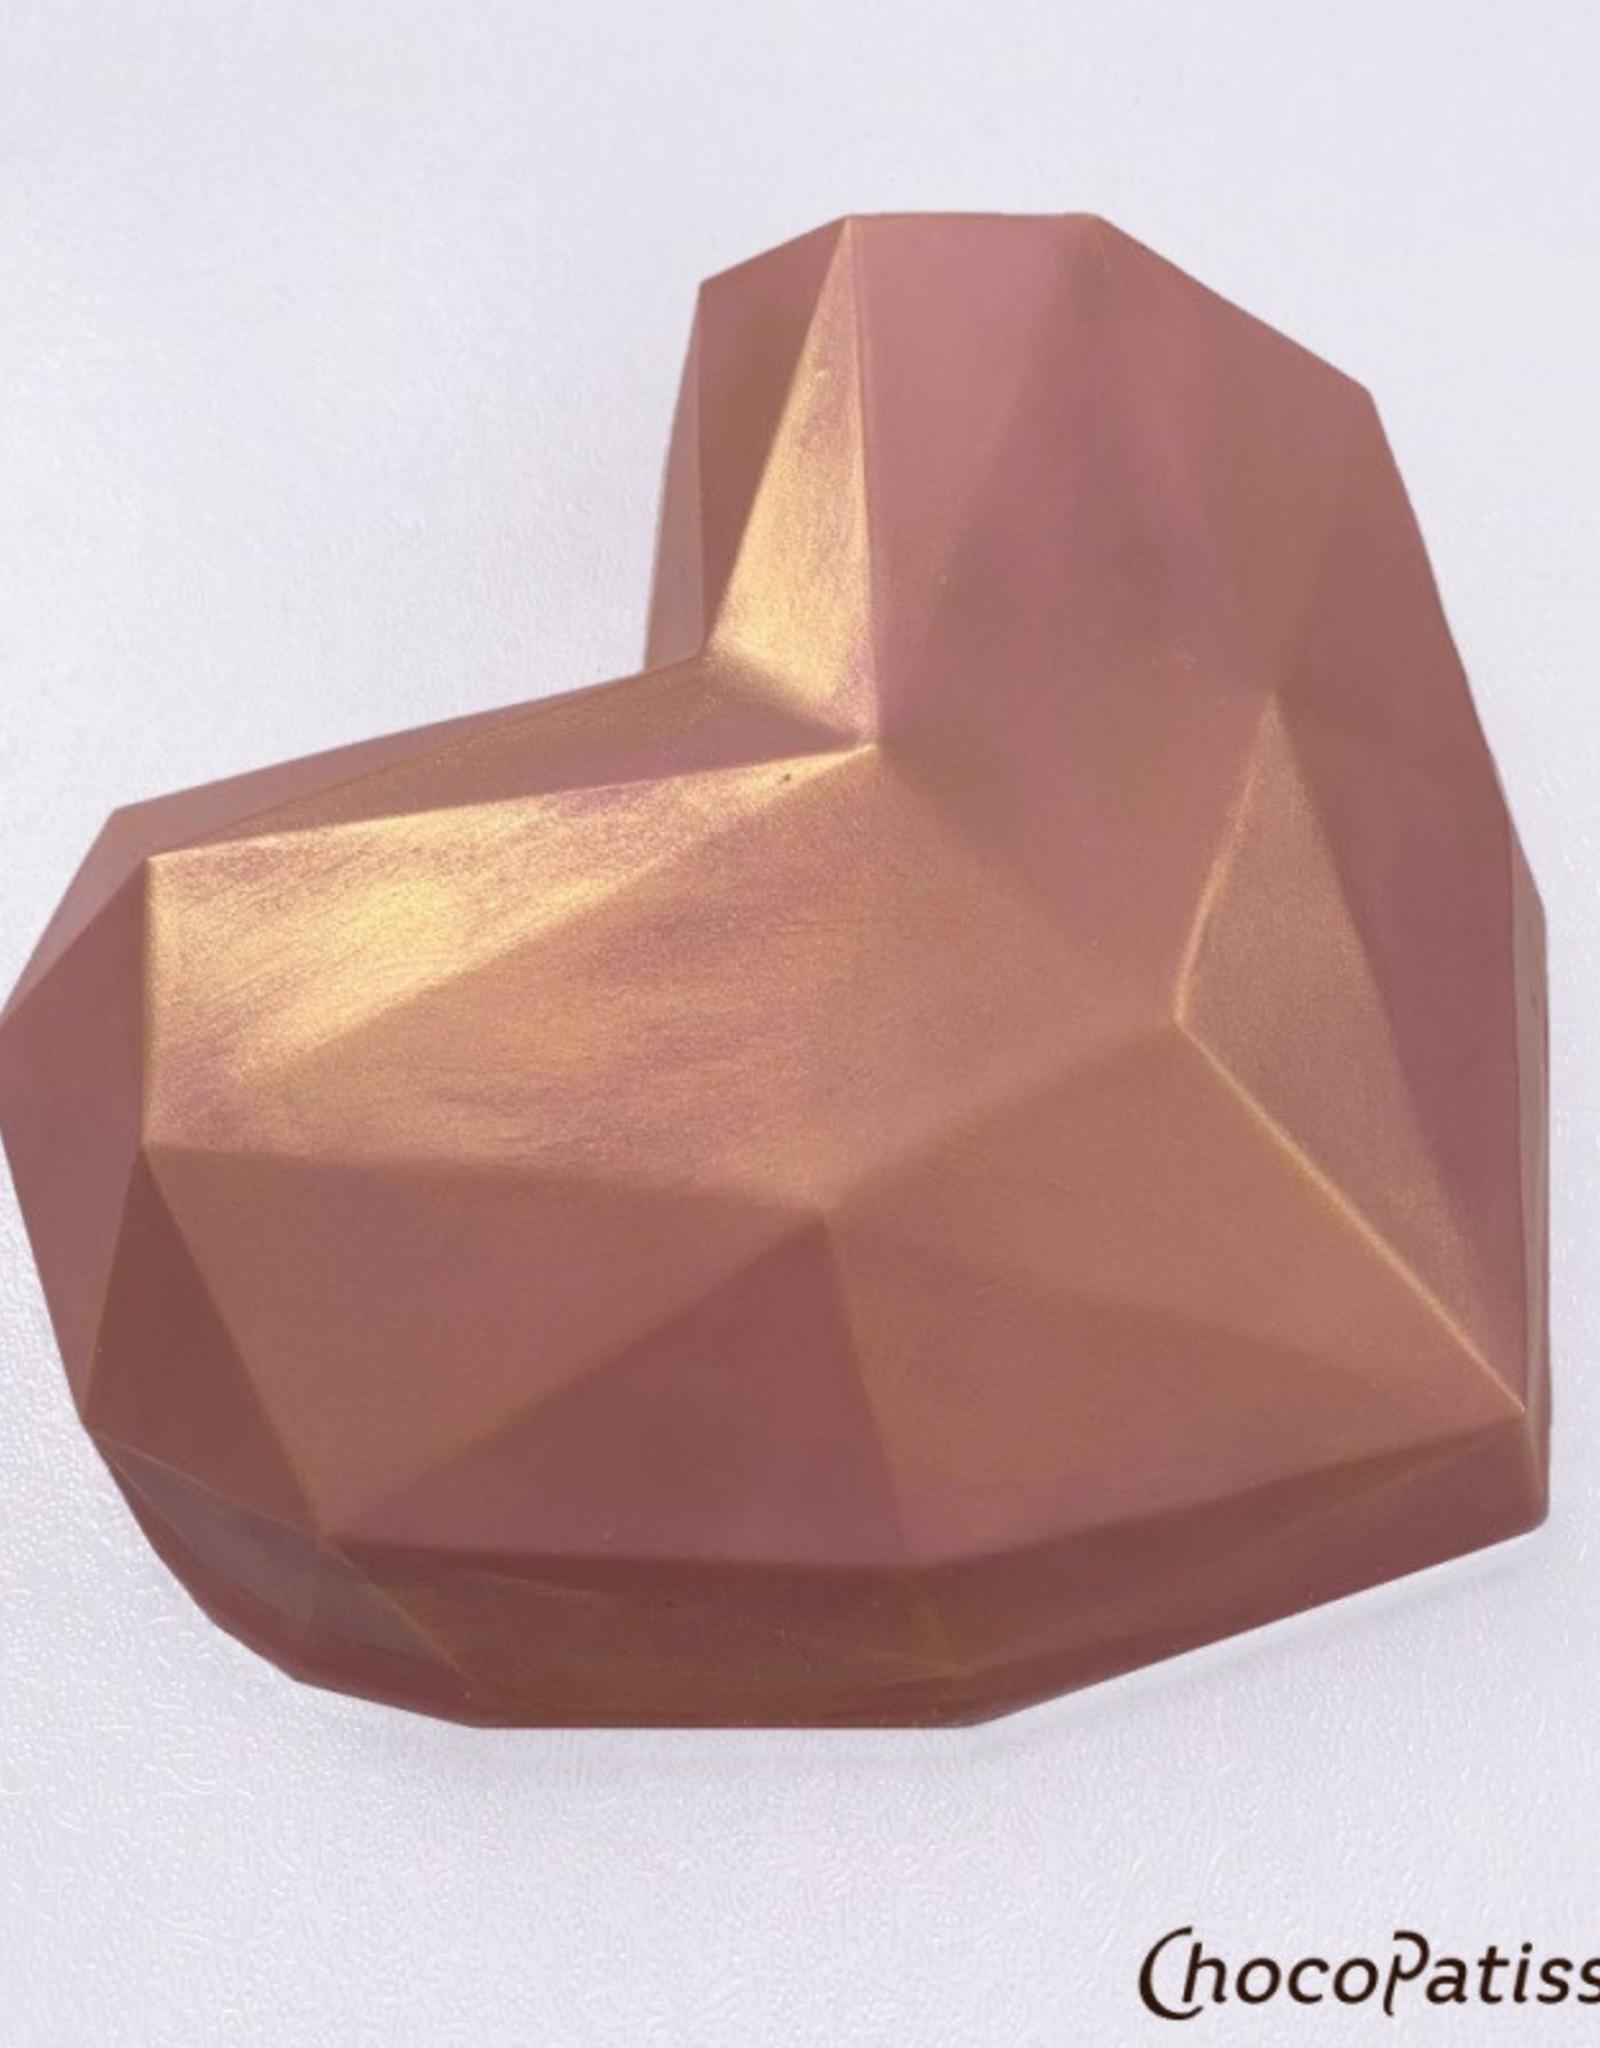 ChocoPatiss Chocolade Holvorm Diamant Hart 13,5x15x4cm